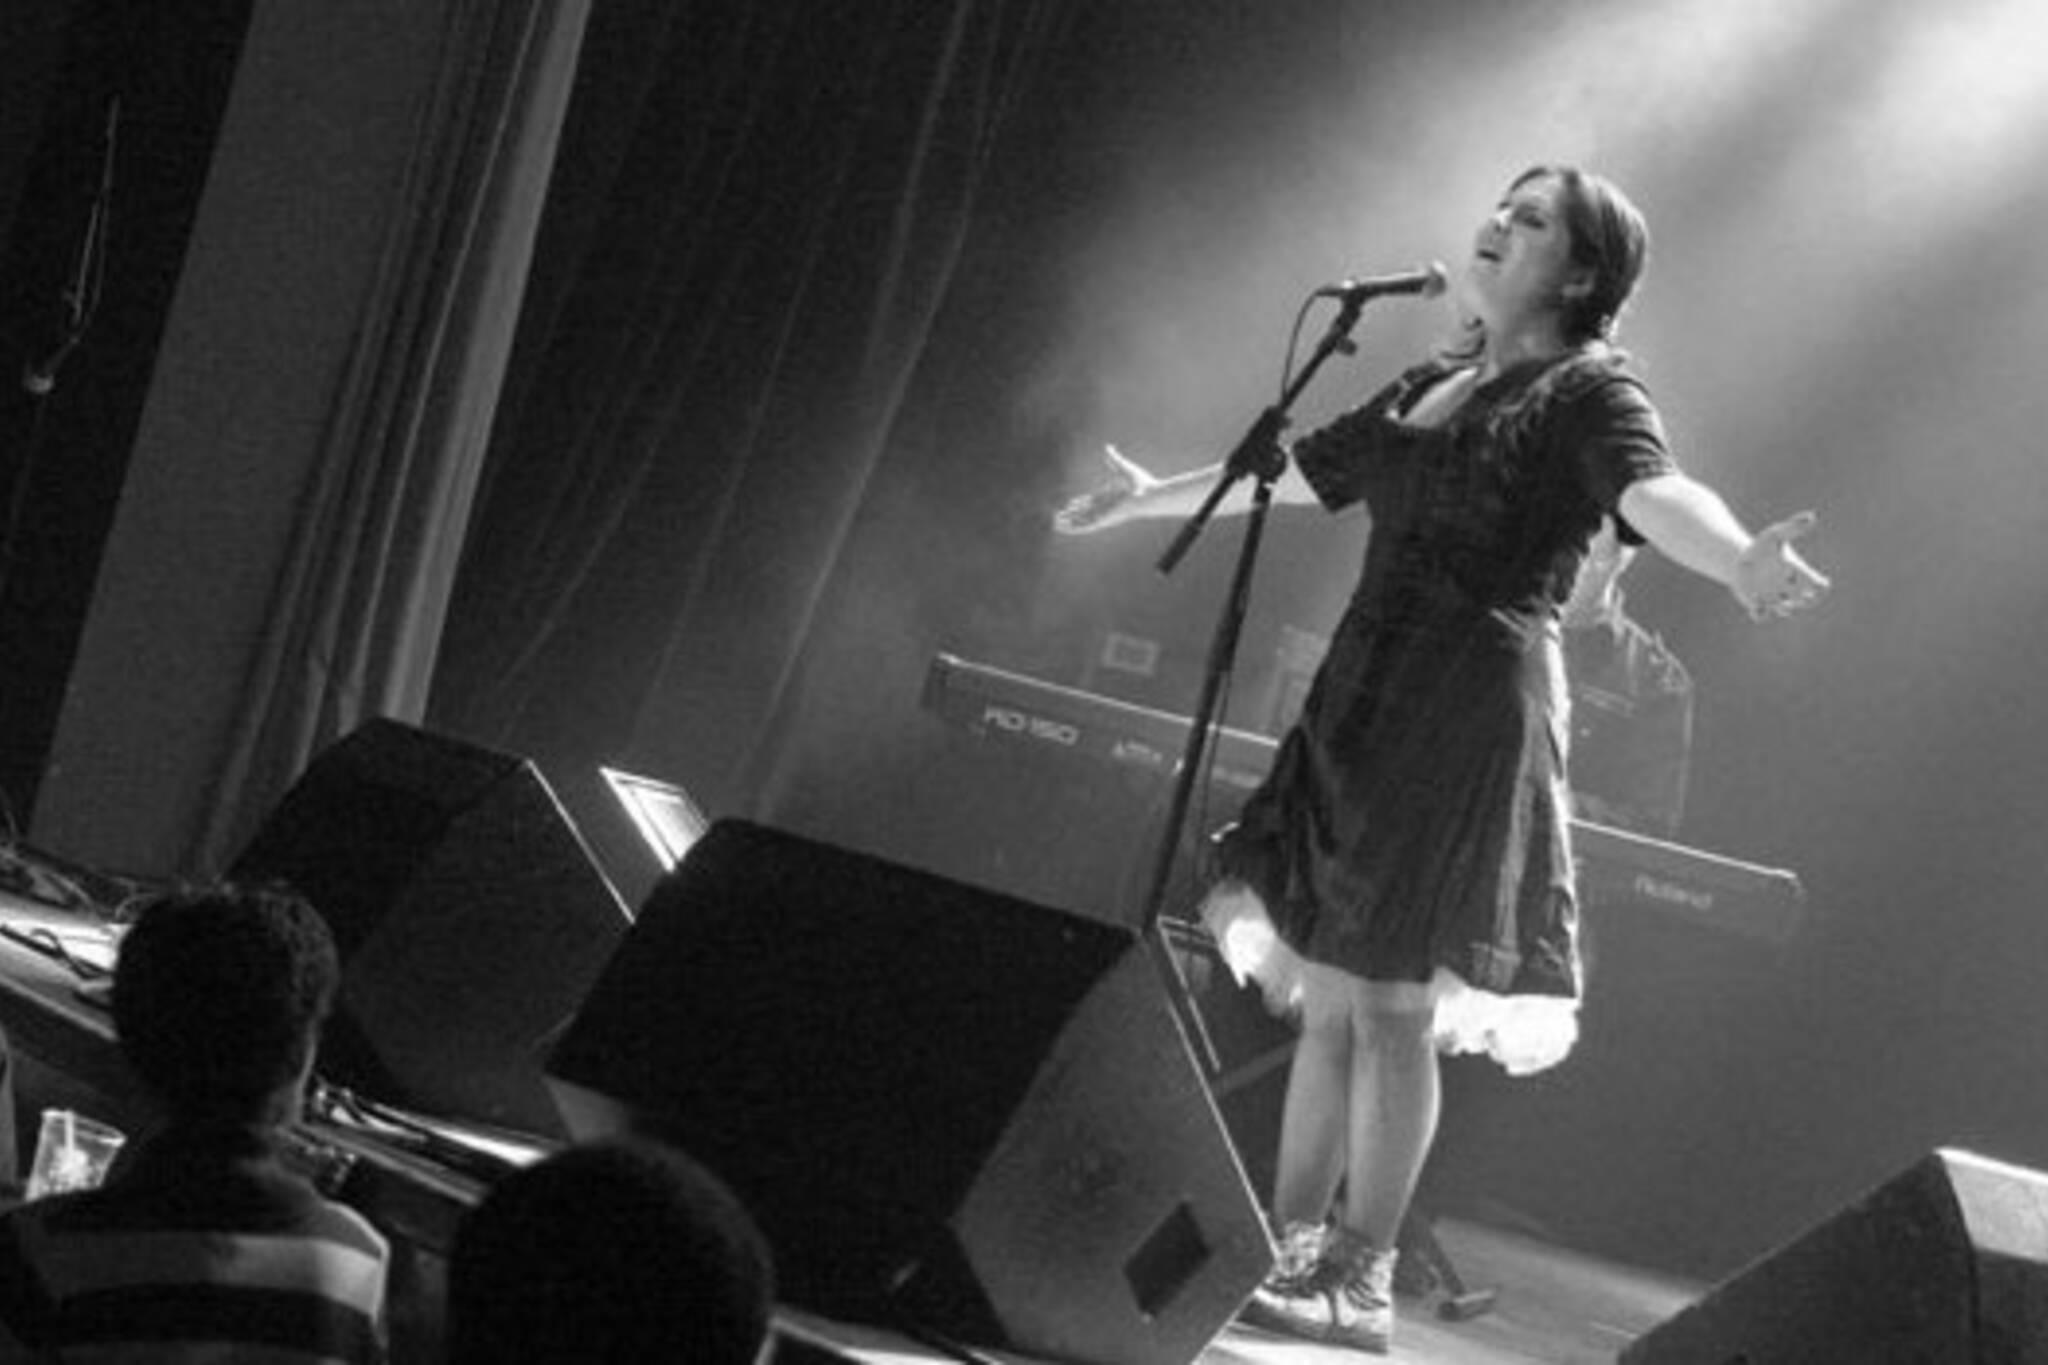 Montreal jazz and cabaret singer Amanda Mabro in town tonight